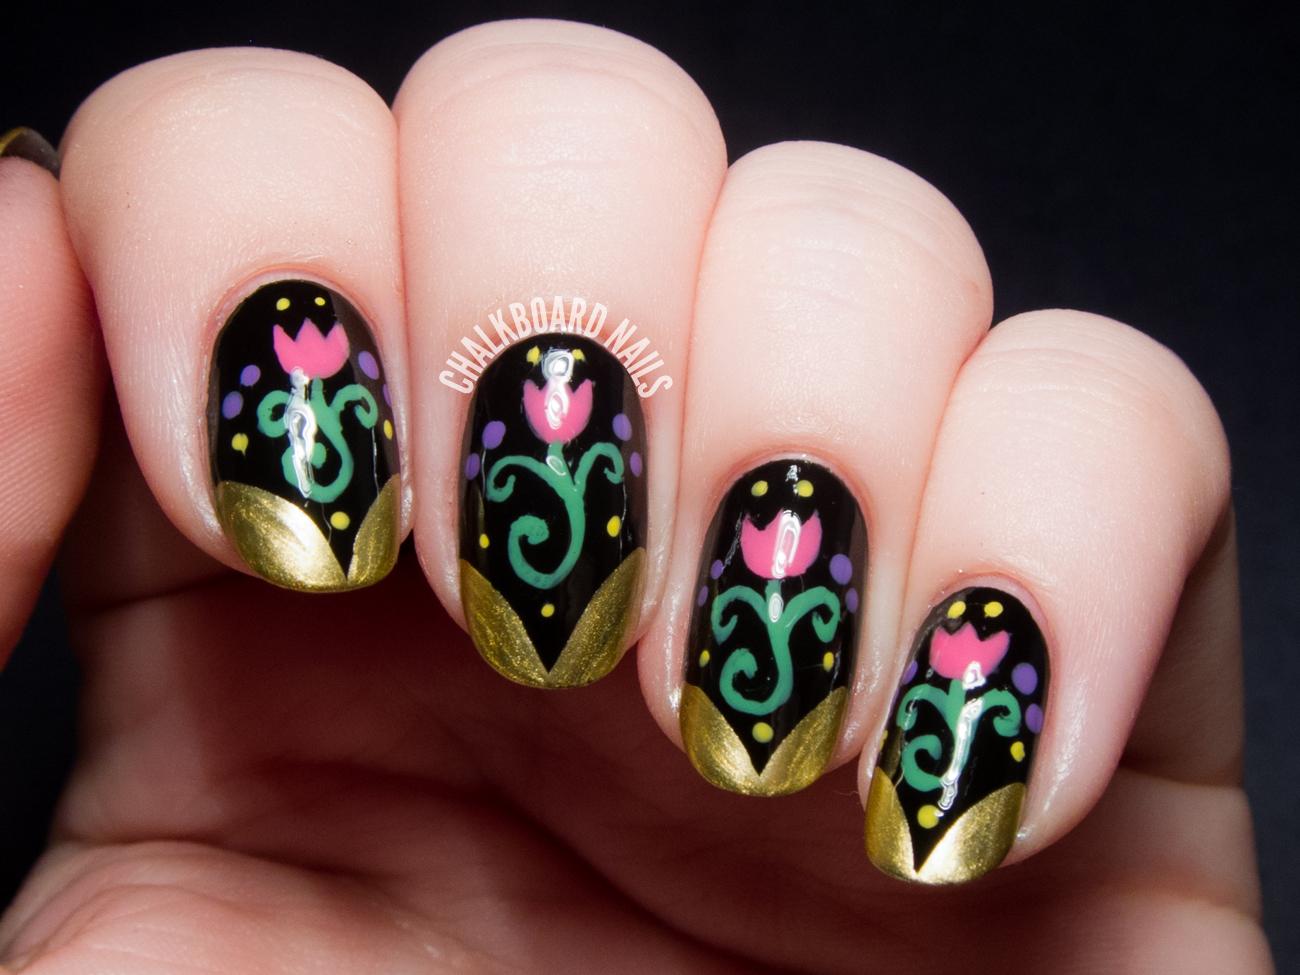 Anna Inspired Frozen Nail Art | Chalkboard Nails | Nail ...